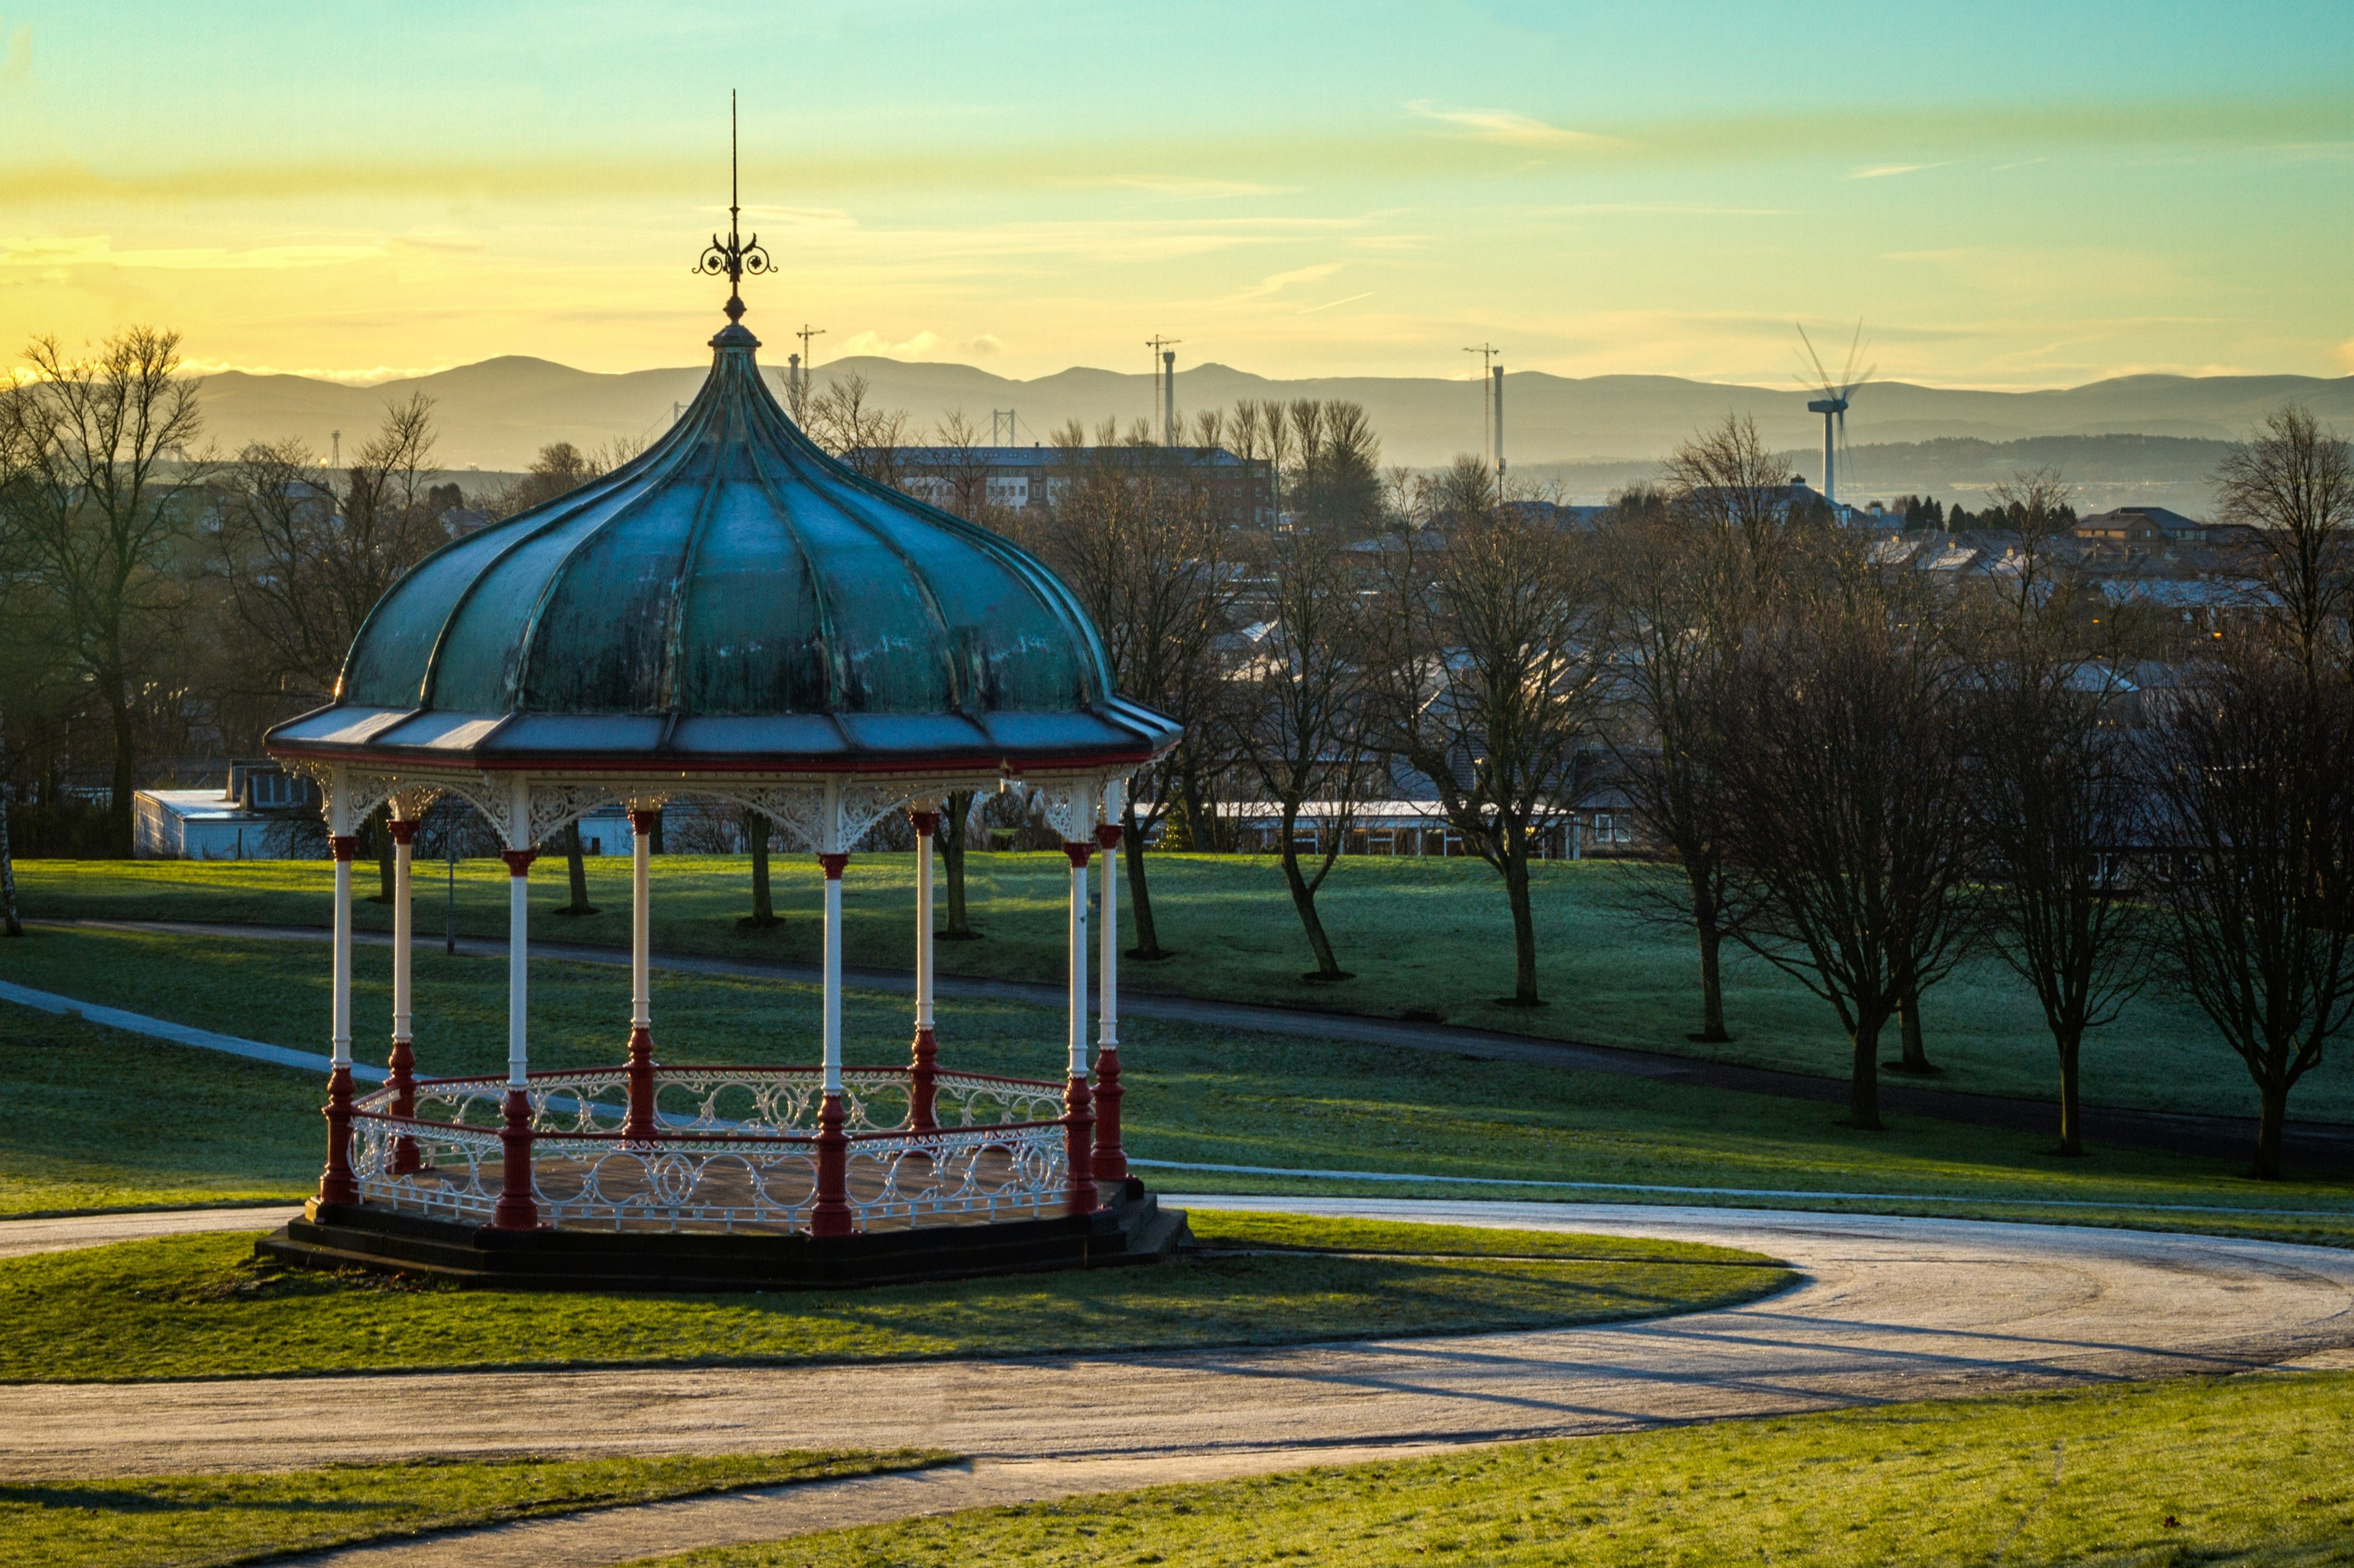 Dunfermline, Scotland, United Kingdom